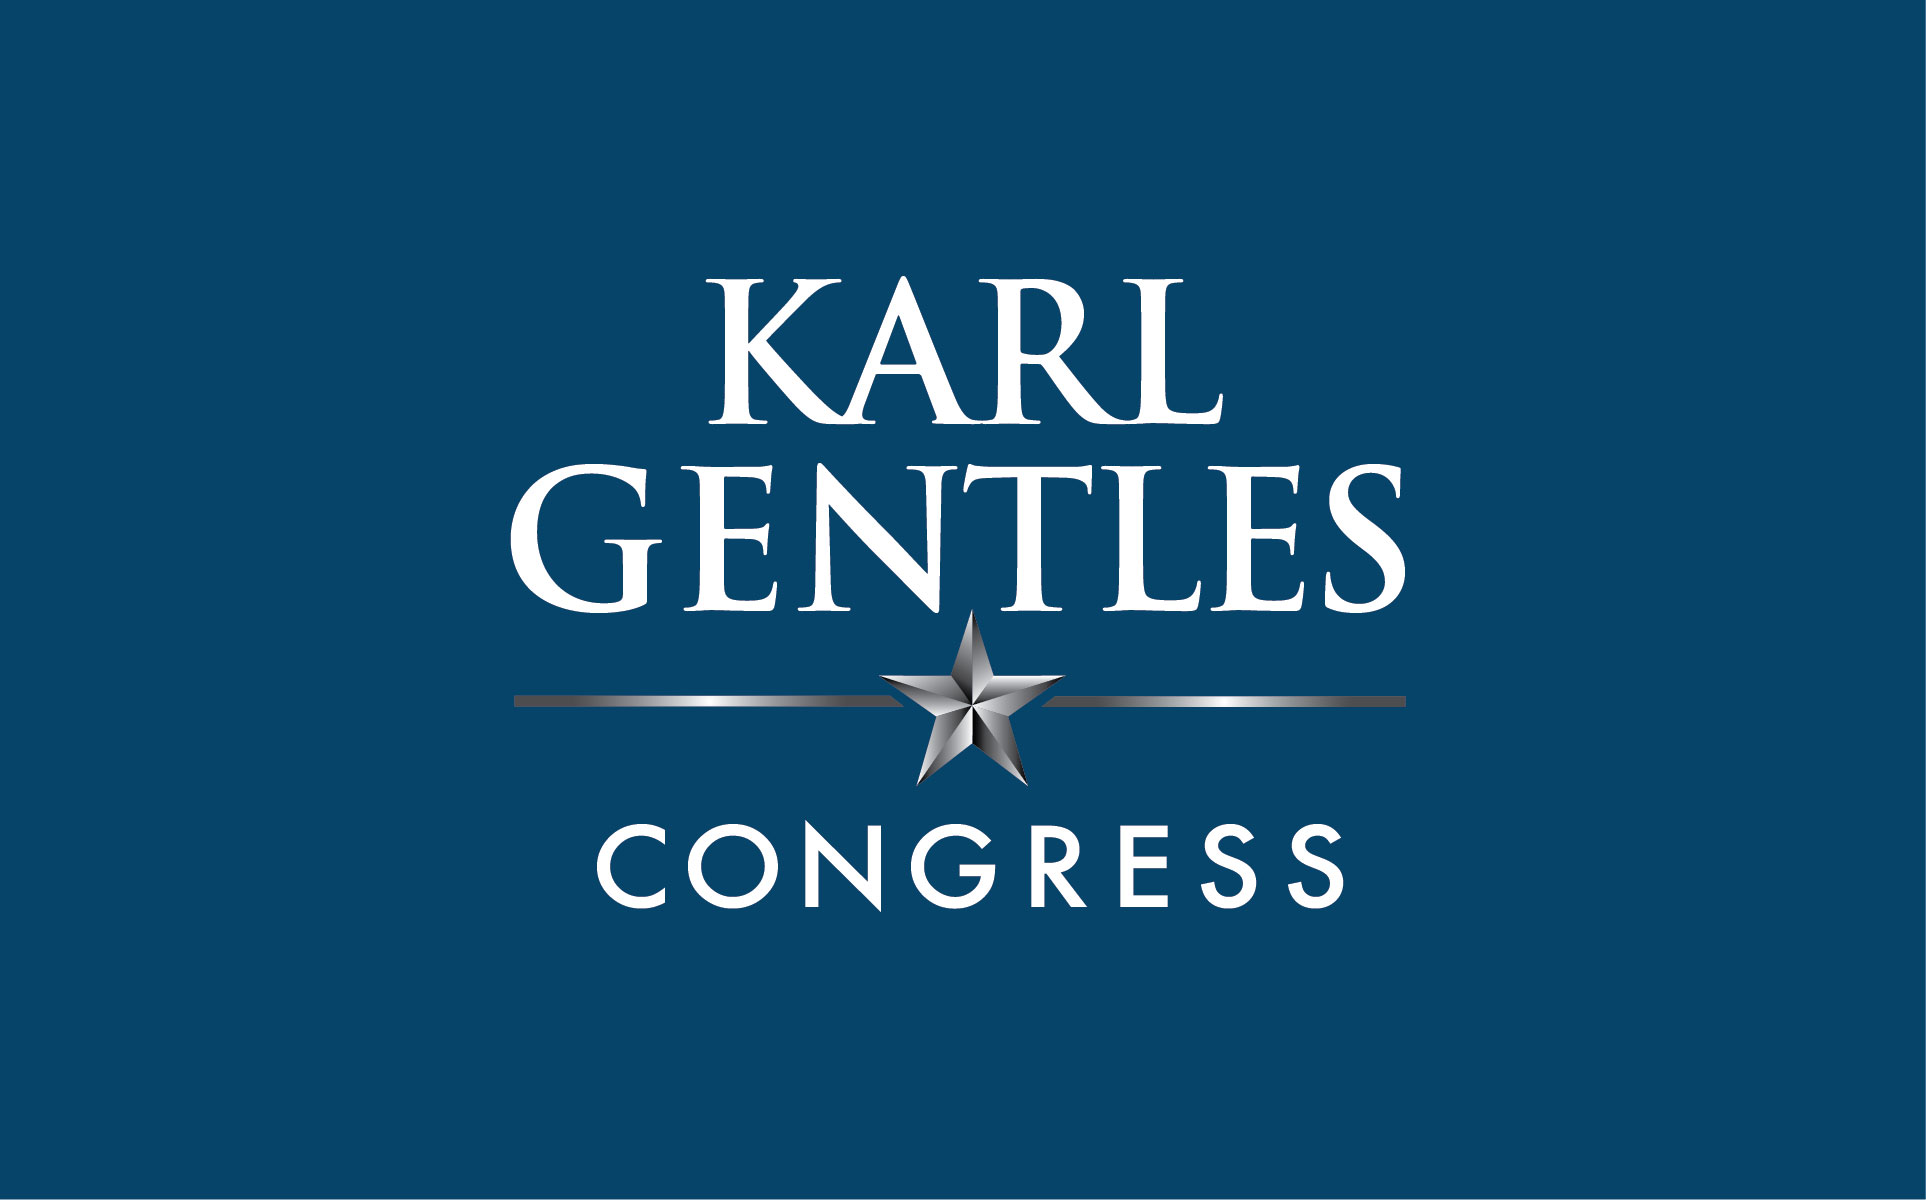 Karl_gentles_campaign_logo_-_final